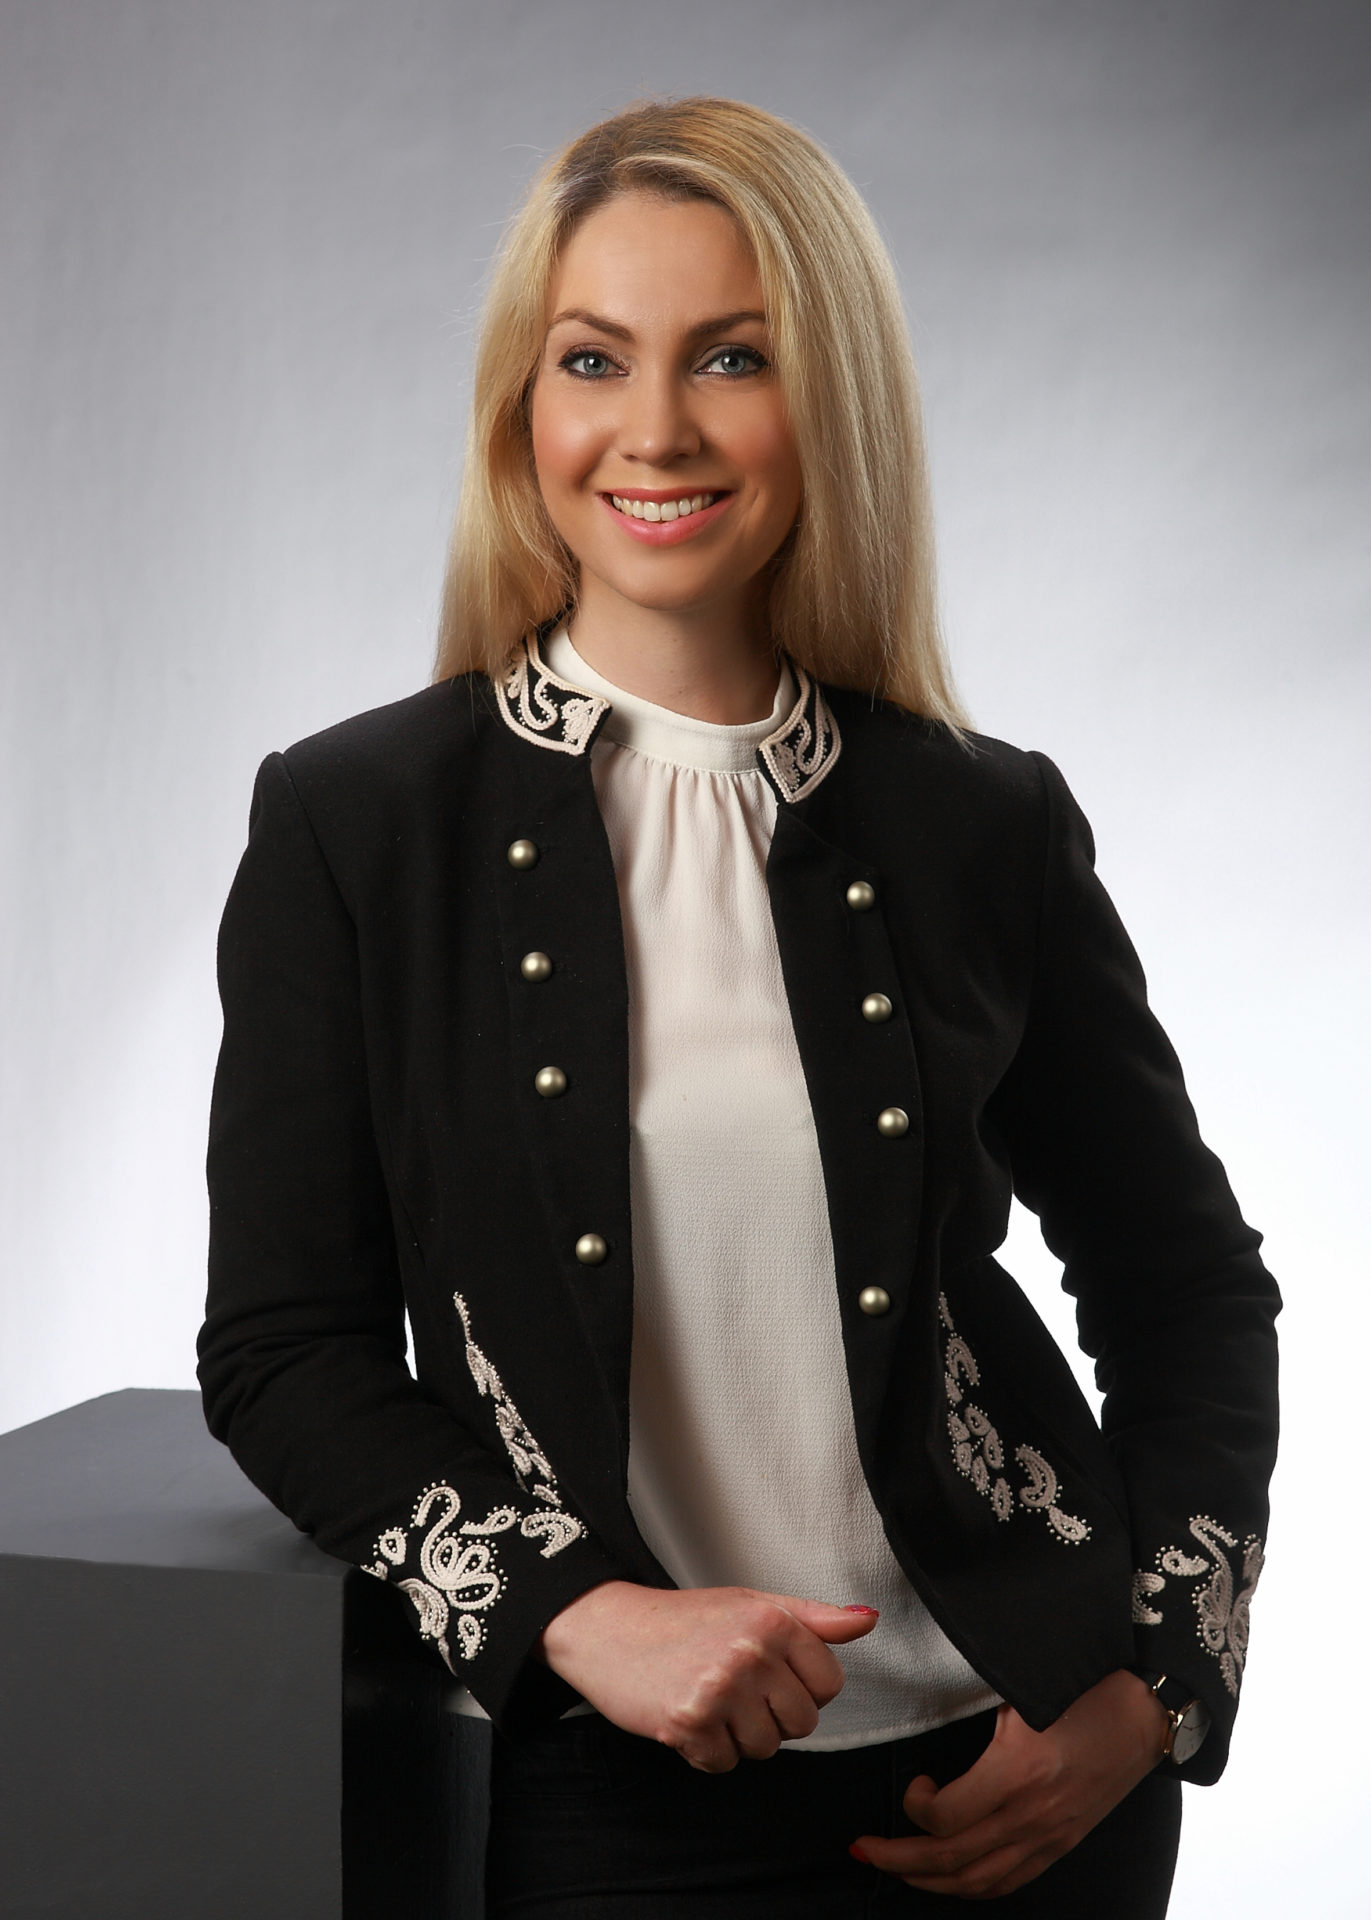 Julia Armatys